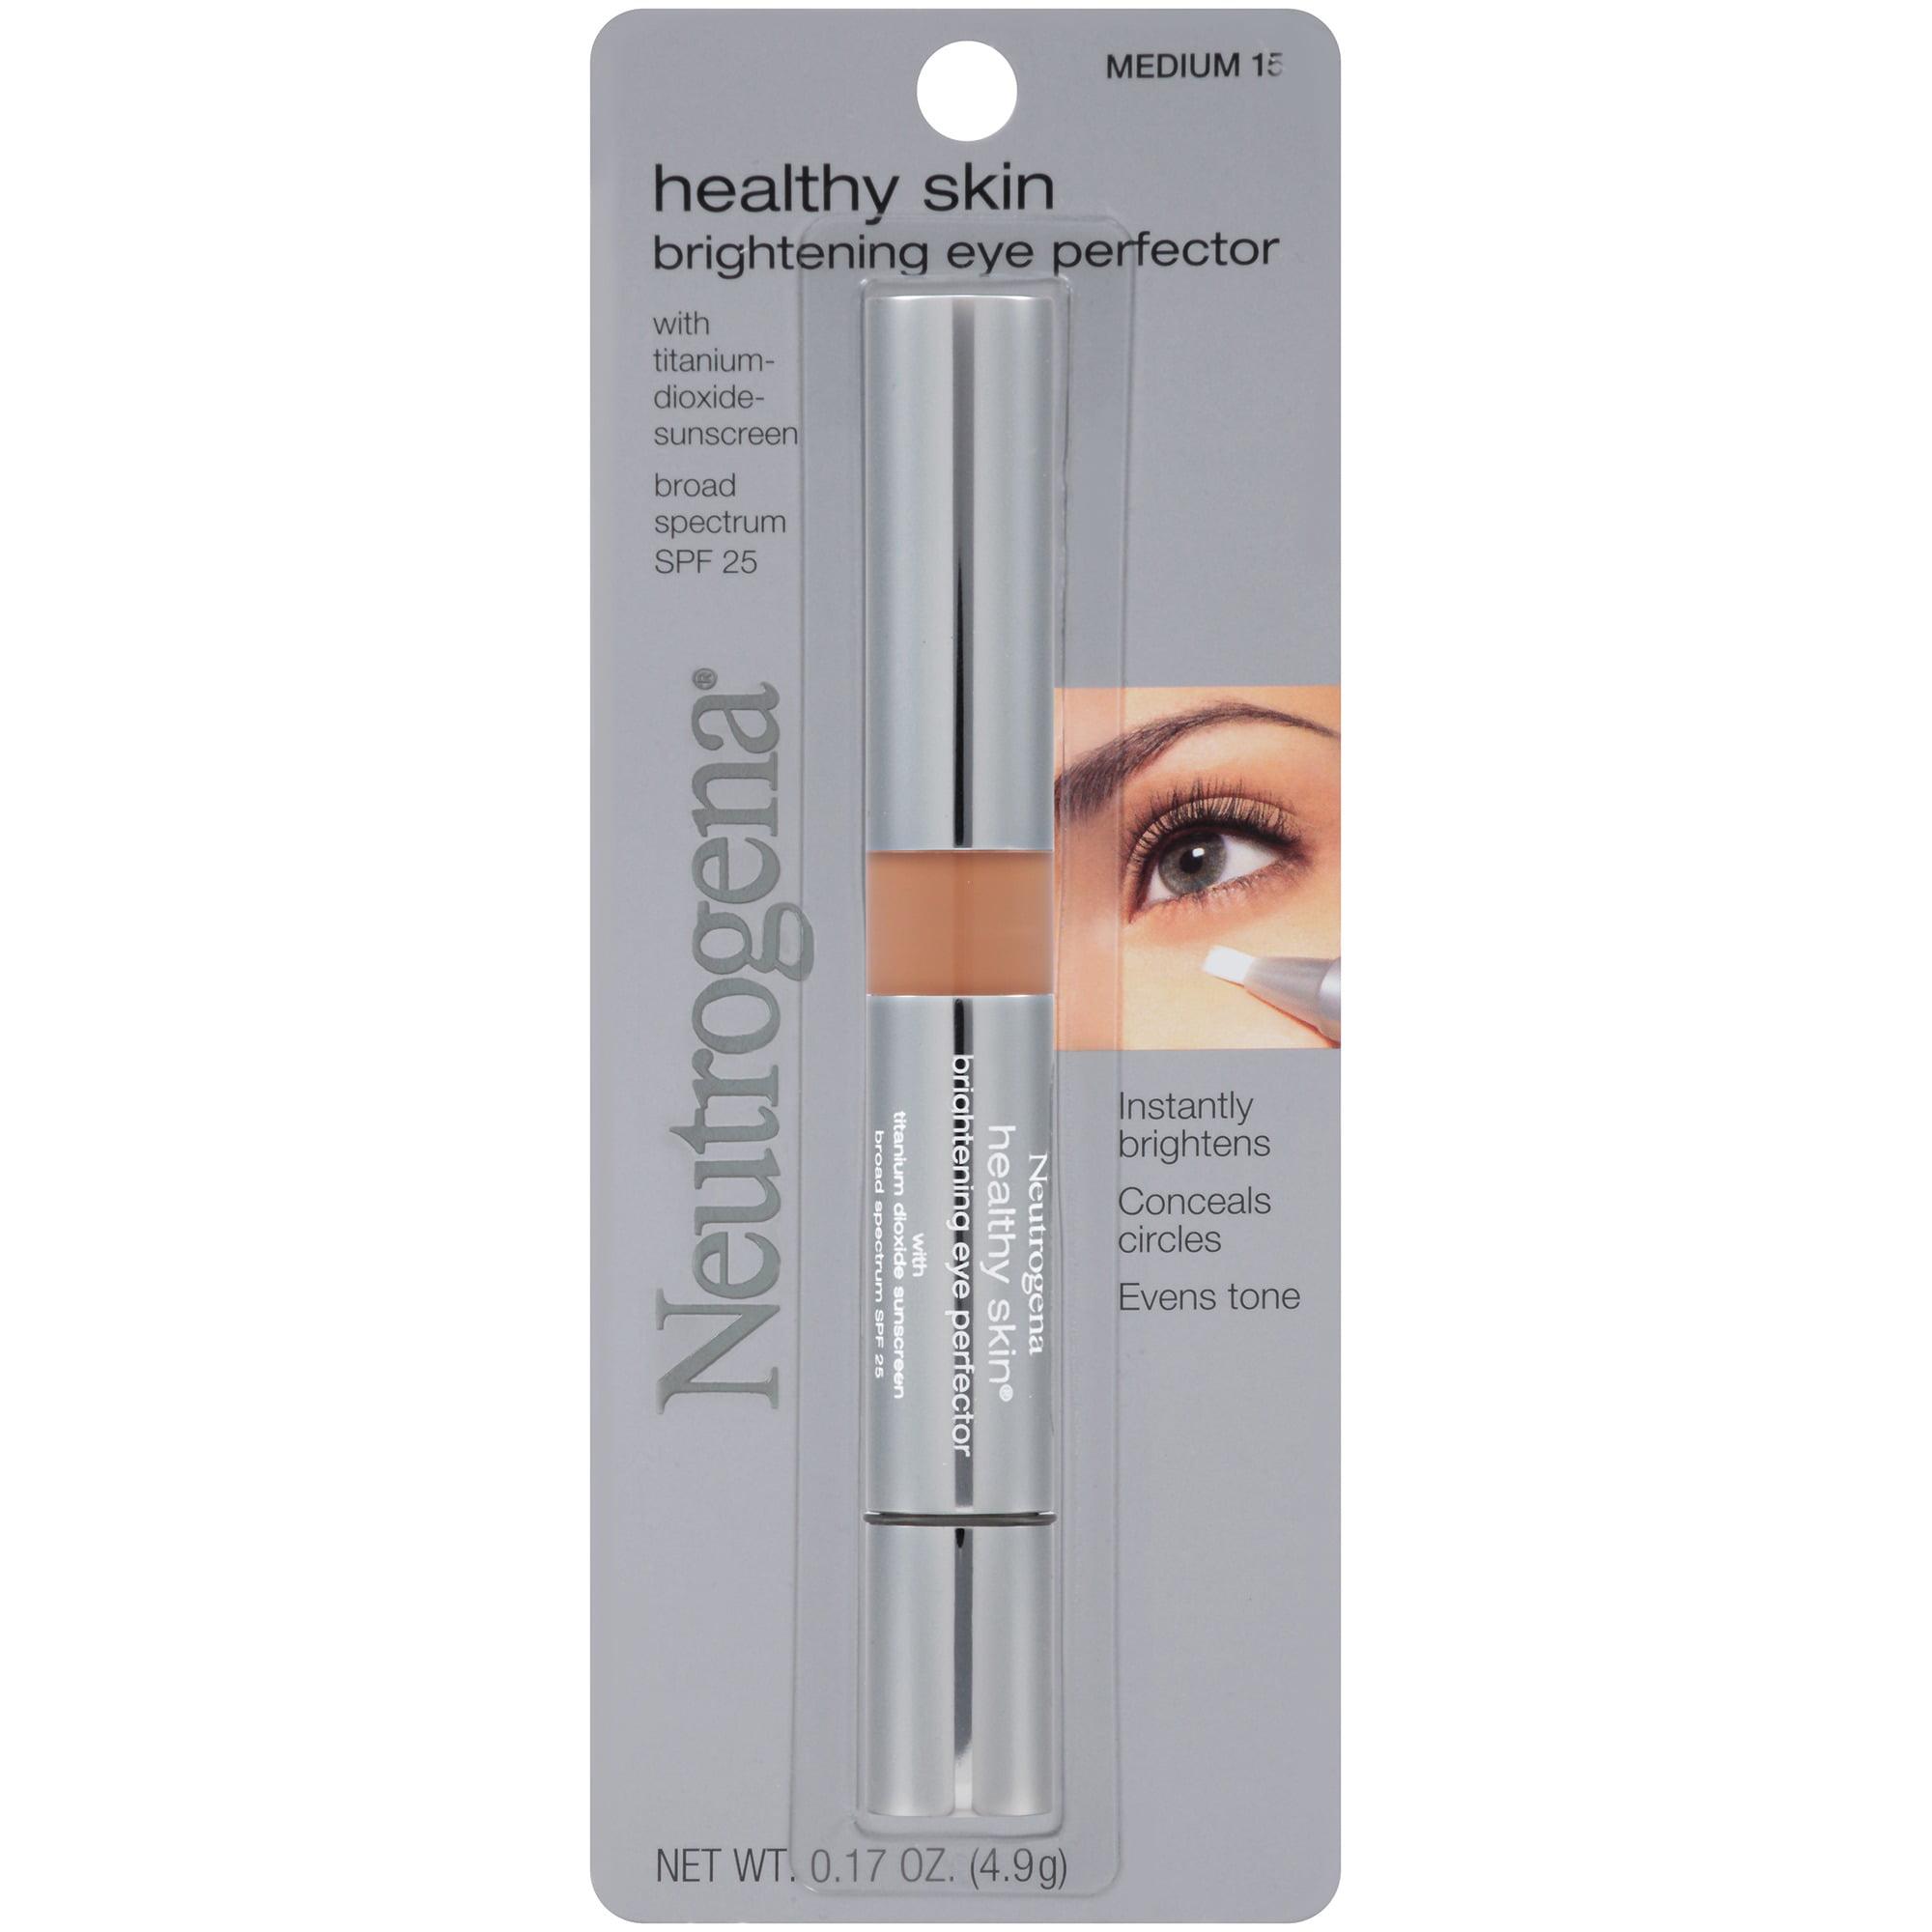 Neutrogena Healthy Skin Brightening Eye Perfector Broad Spectrum SPF 25, Medium 15, .17 Oz